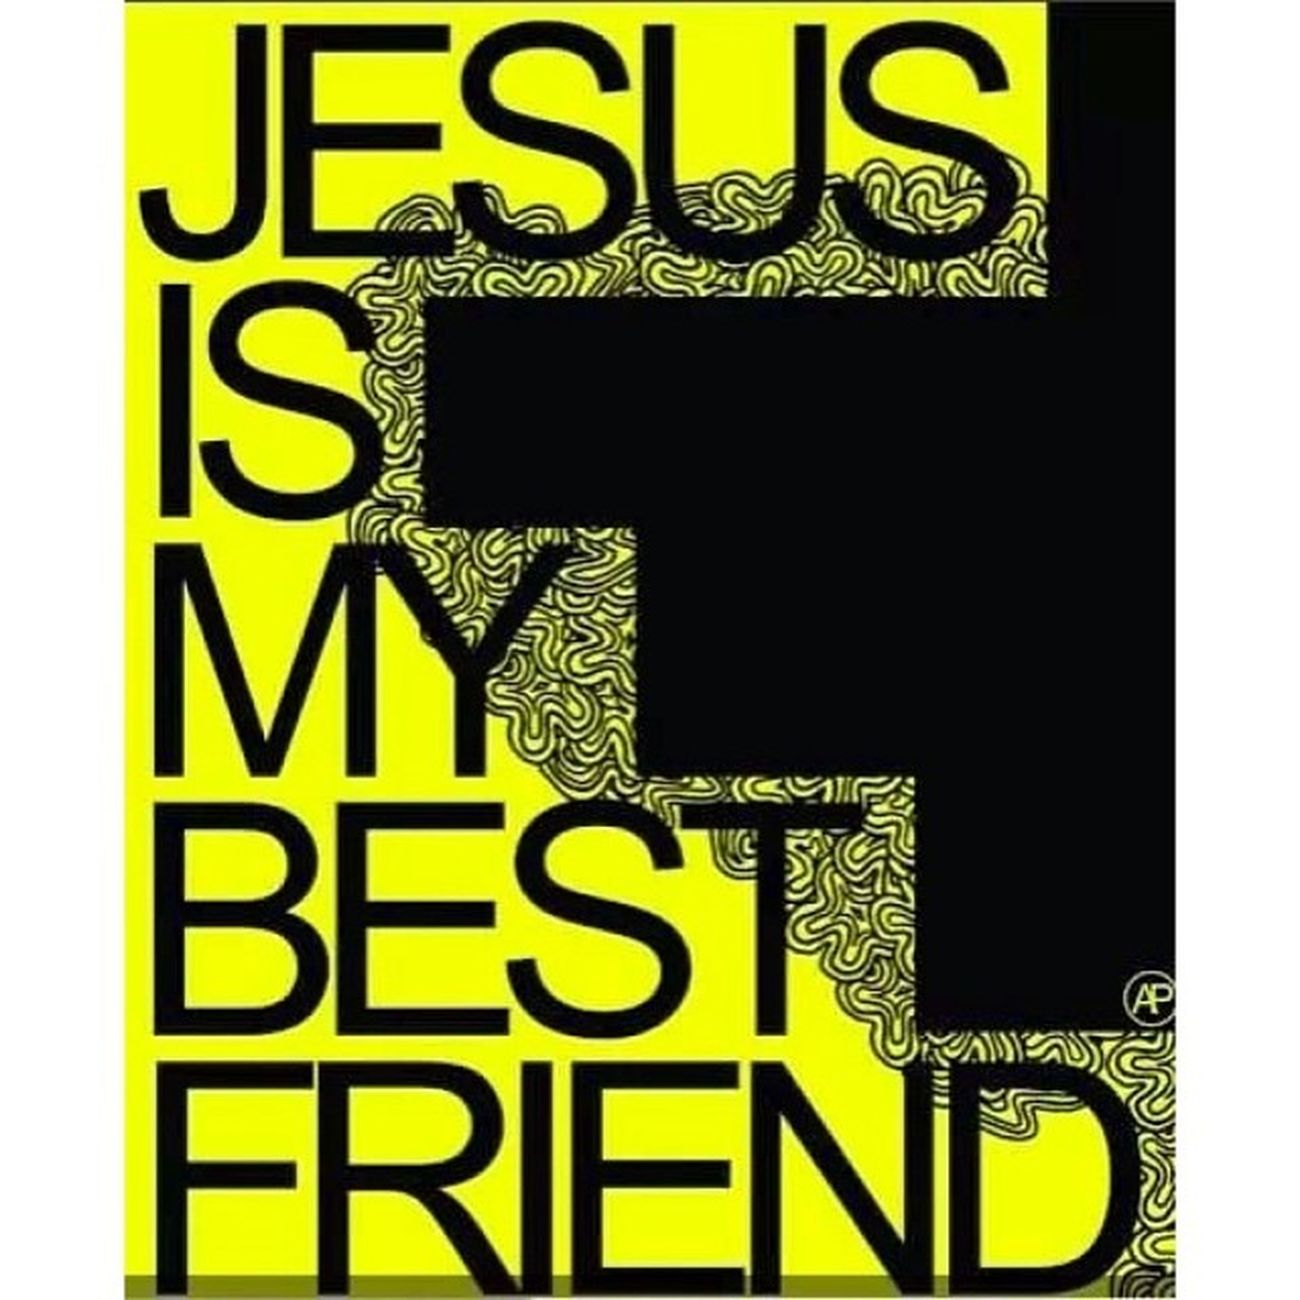 Jesus Friend Yee